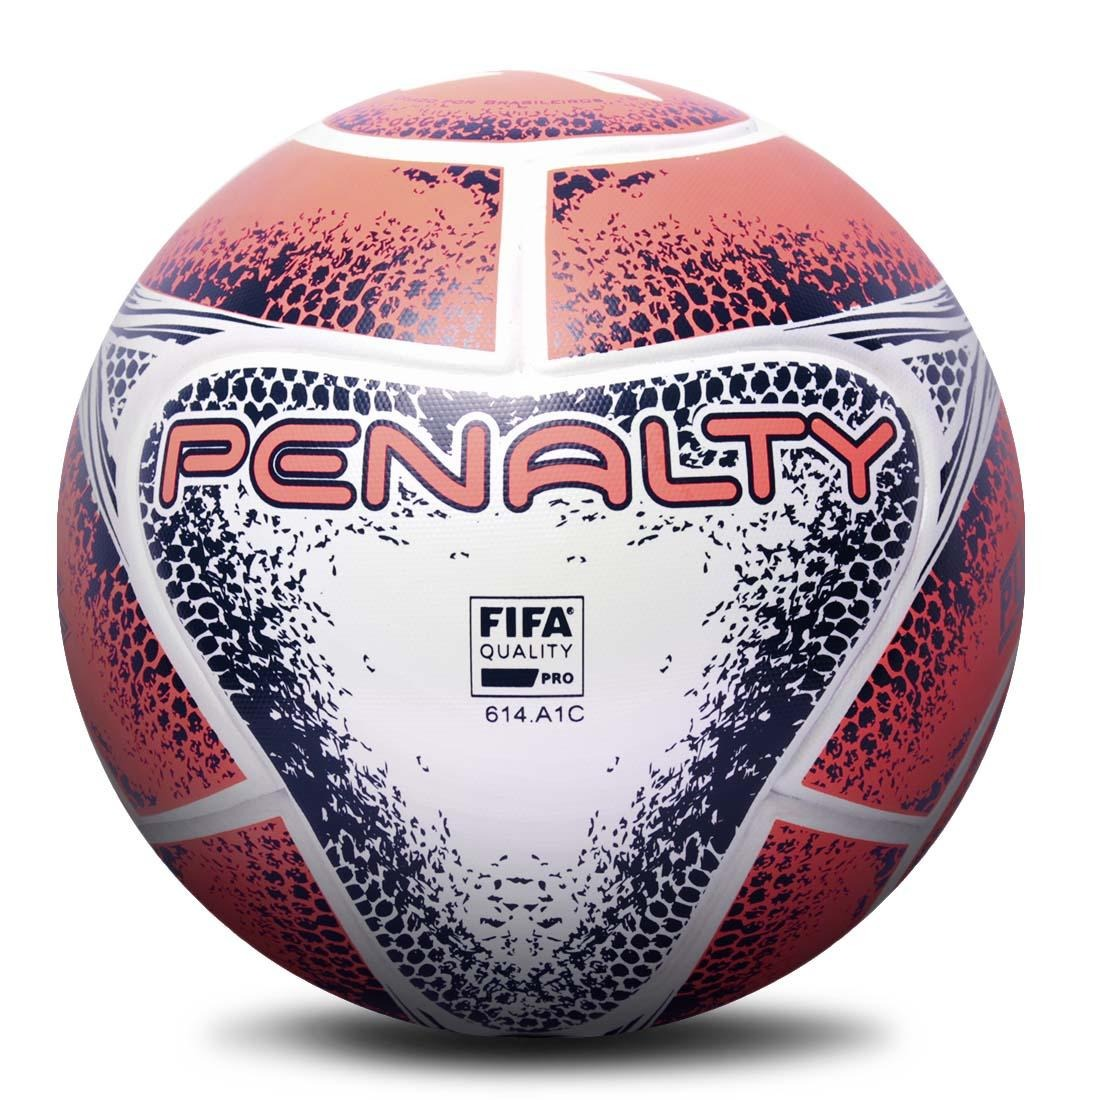 dc1e7bb67 bola futsal penalty max 1000 aprovada fifa 2018 na caixa. Carregando zoom.